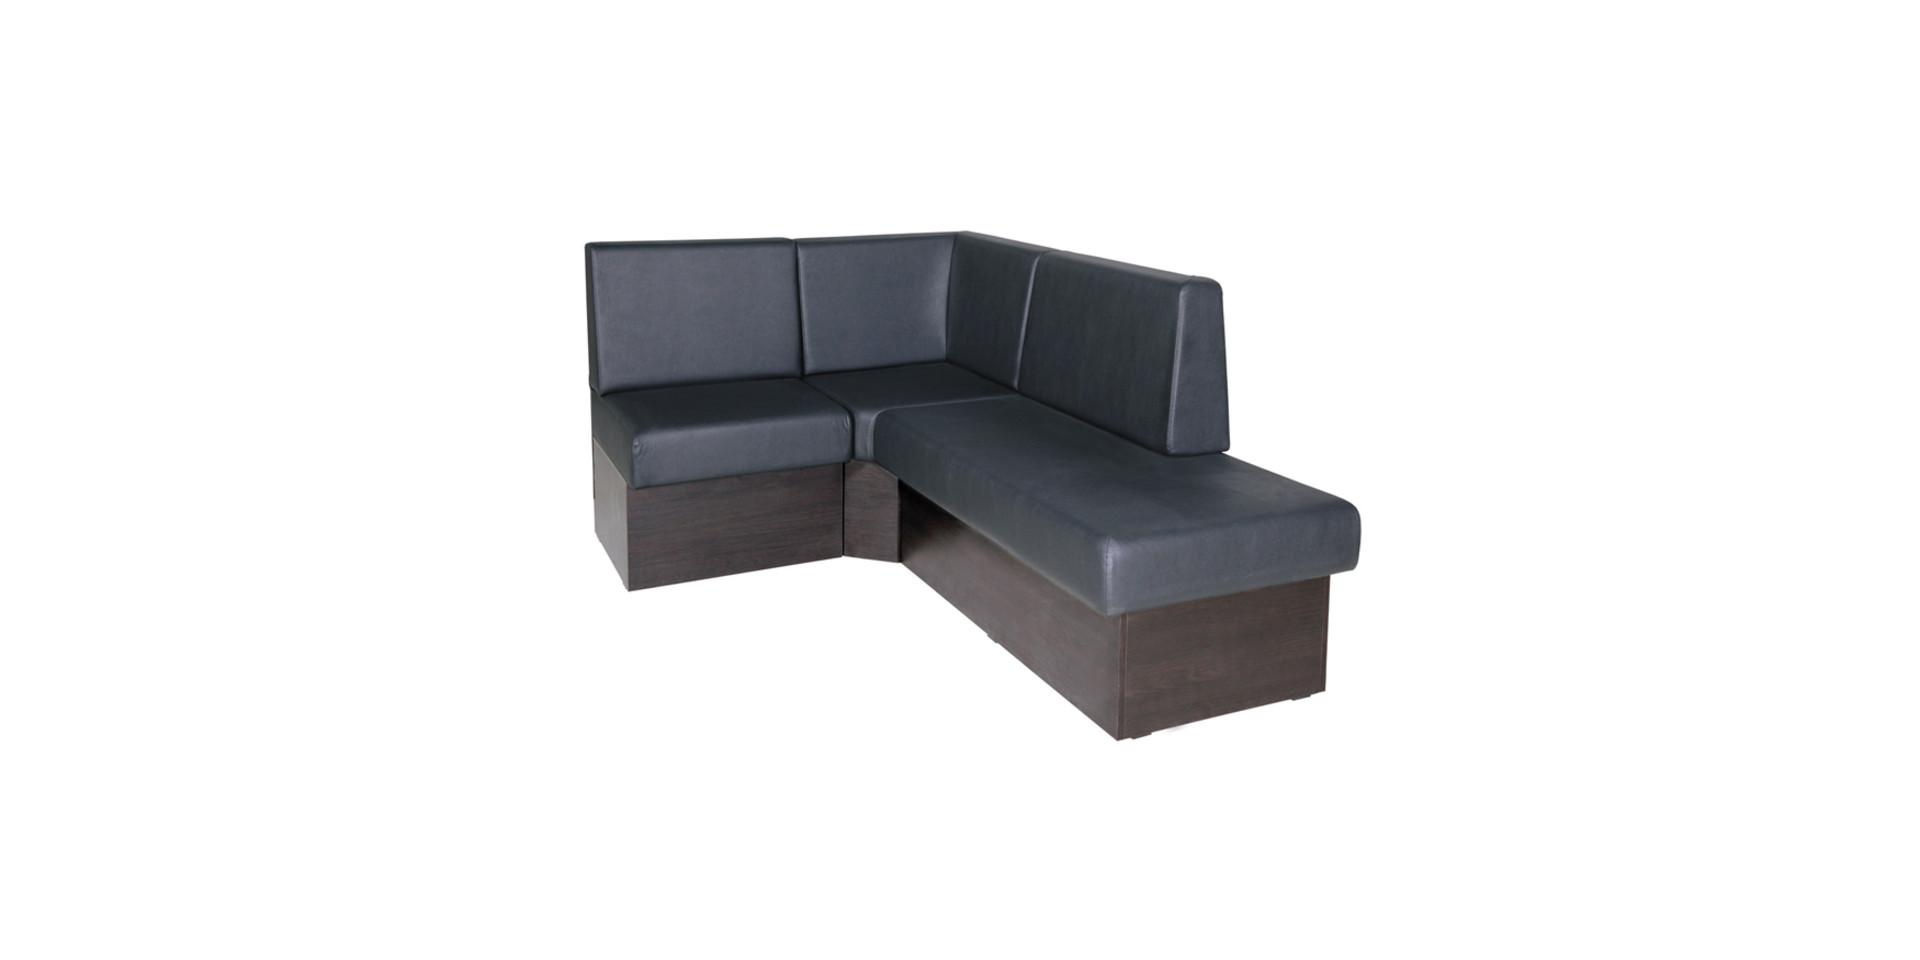 sits-hedda-angle-element100_corner90_bench_oasi_black_4